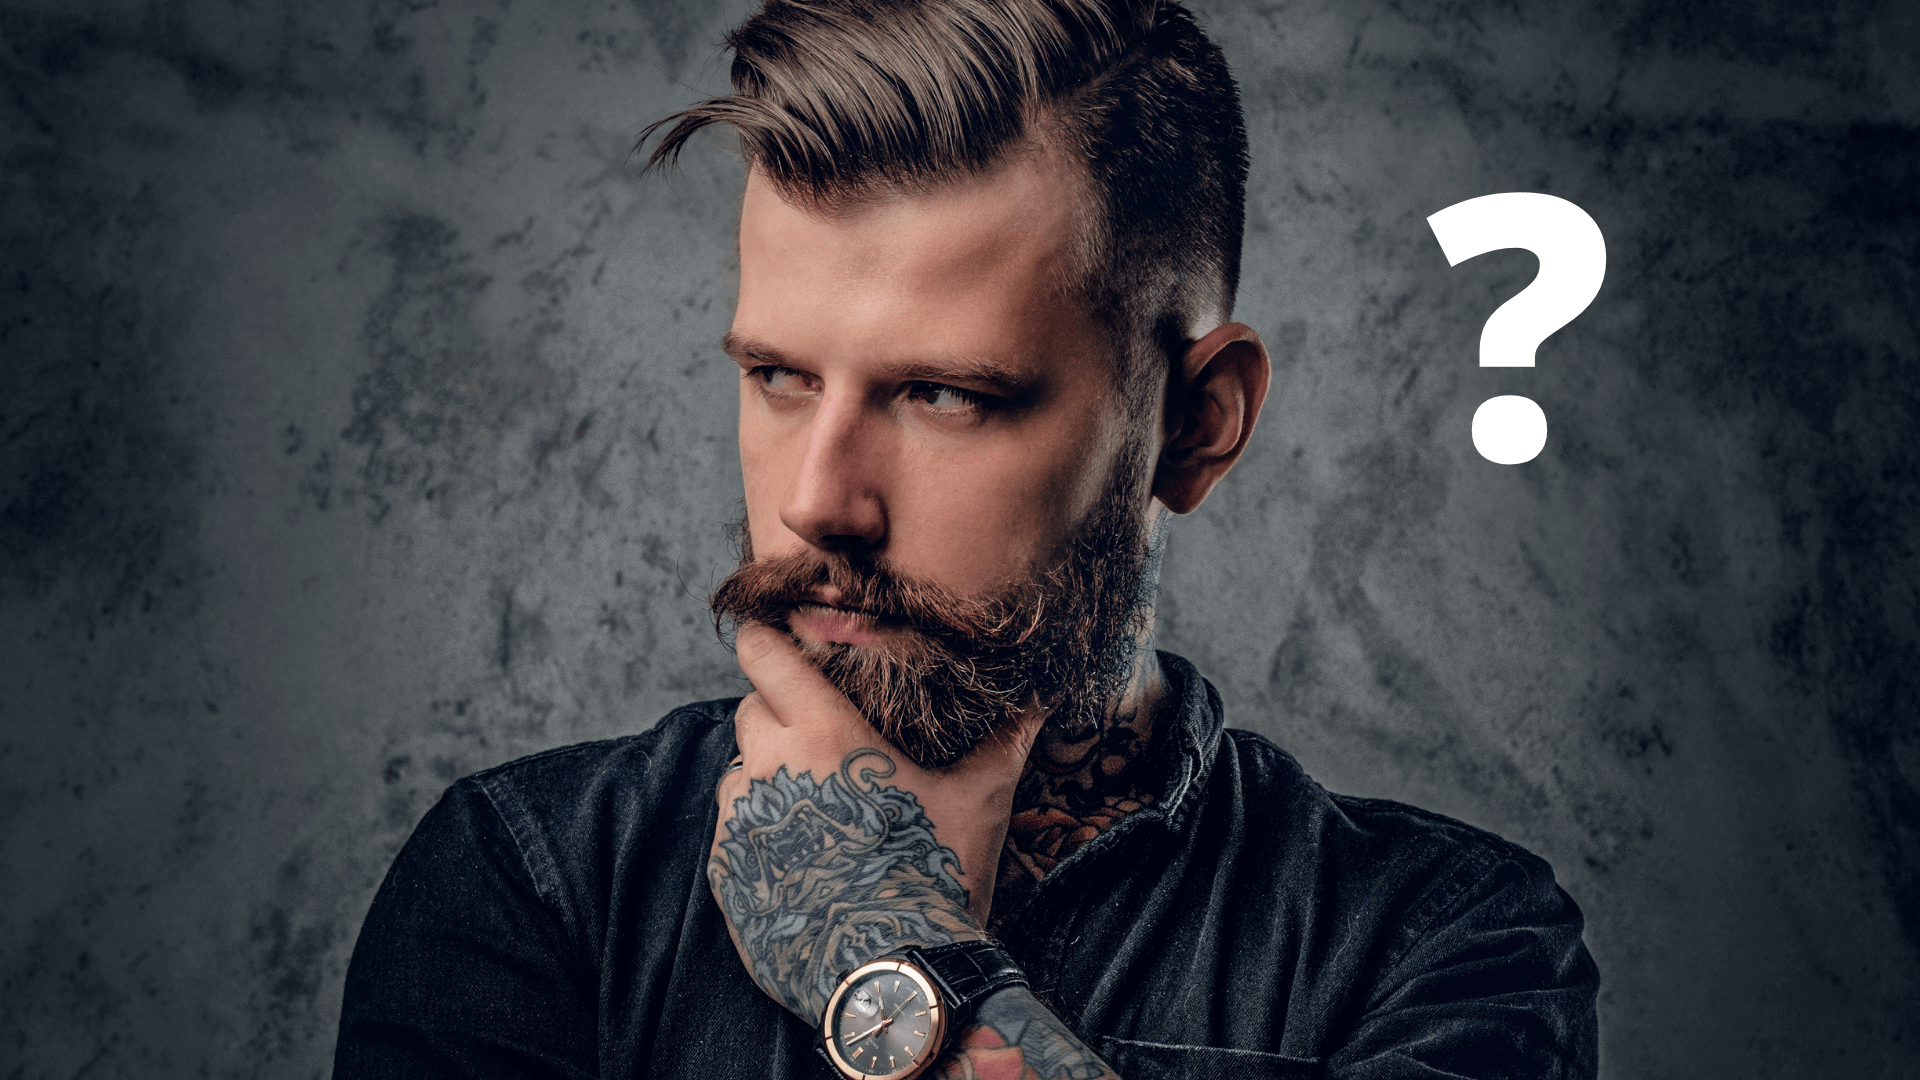 How Long Does Beard Club Take To Ship